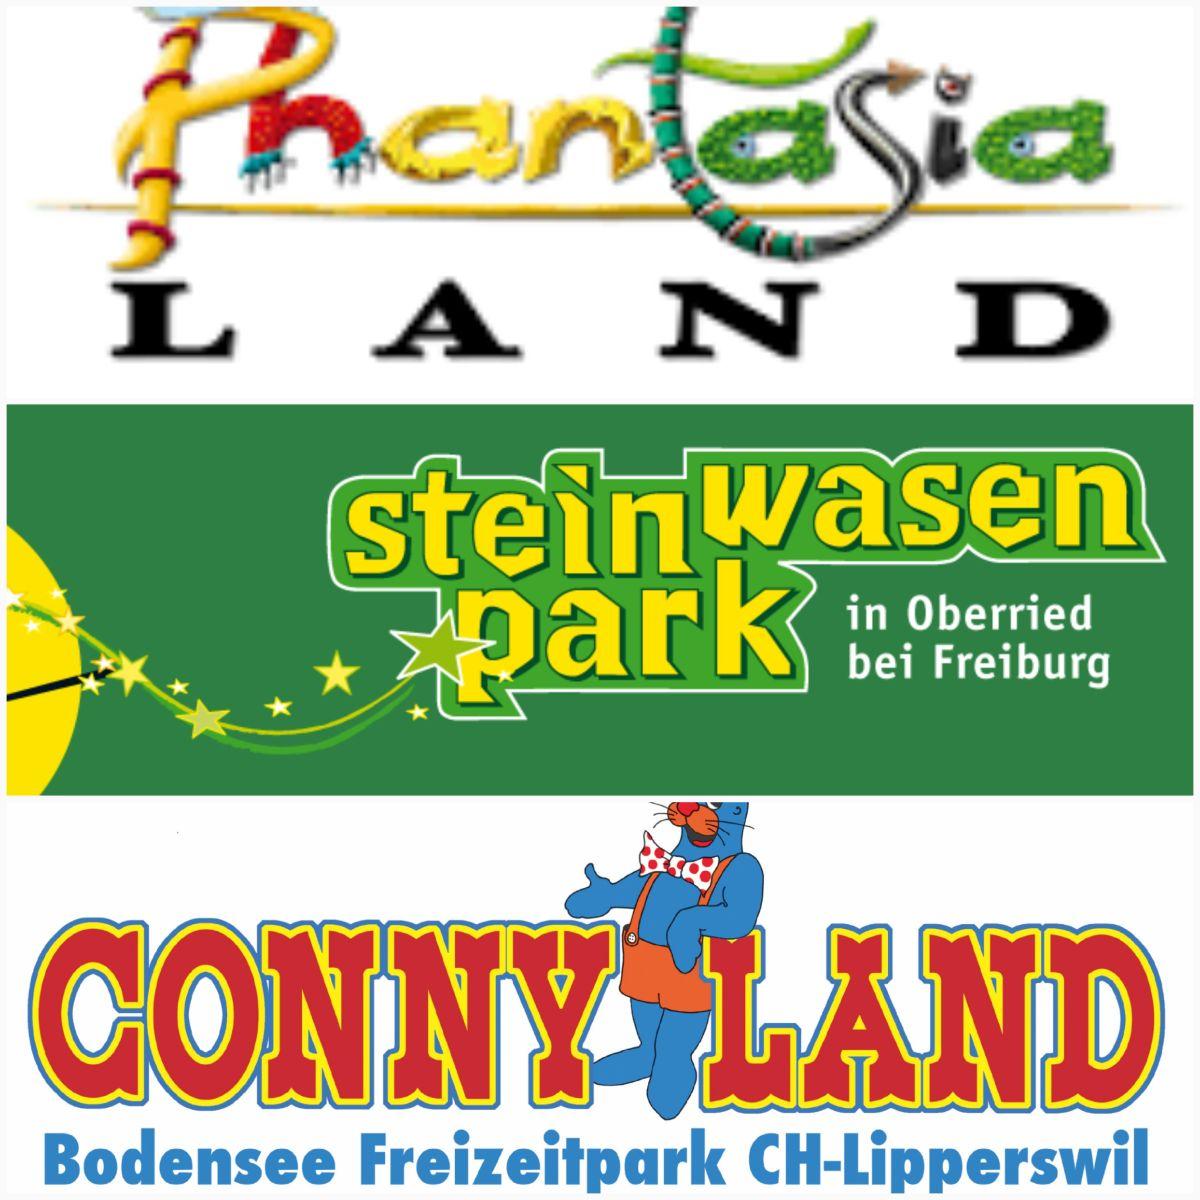 3 Best Freizeitparks for kids under 10 in Germany in myexperience